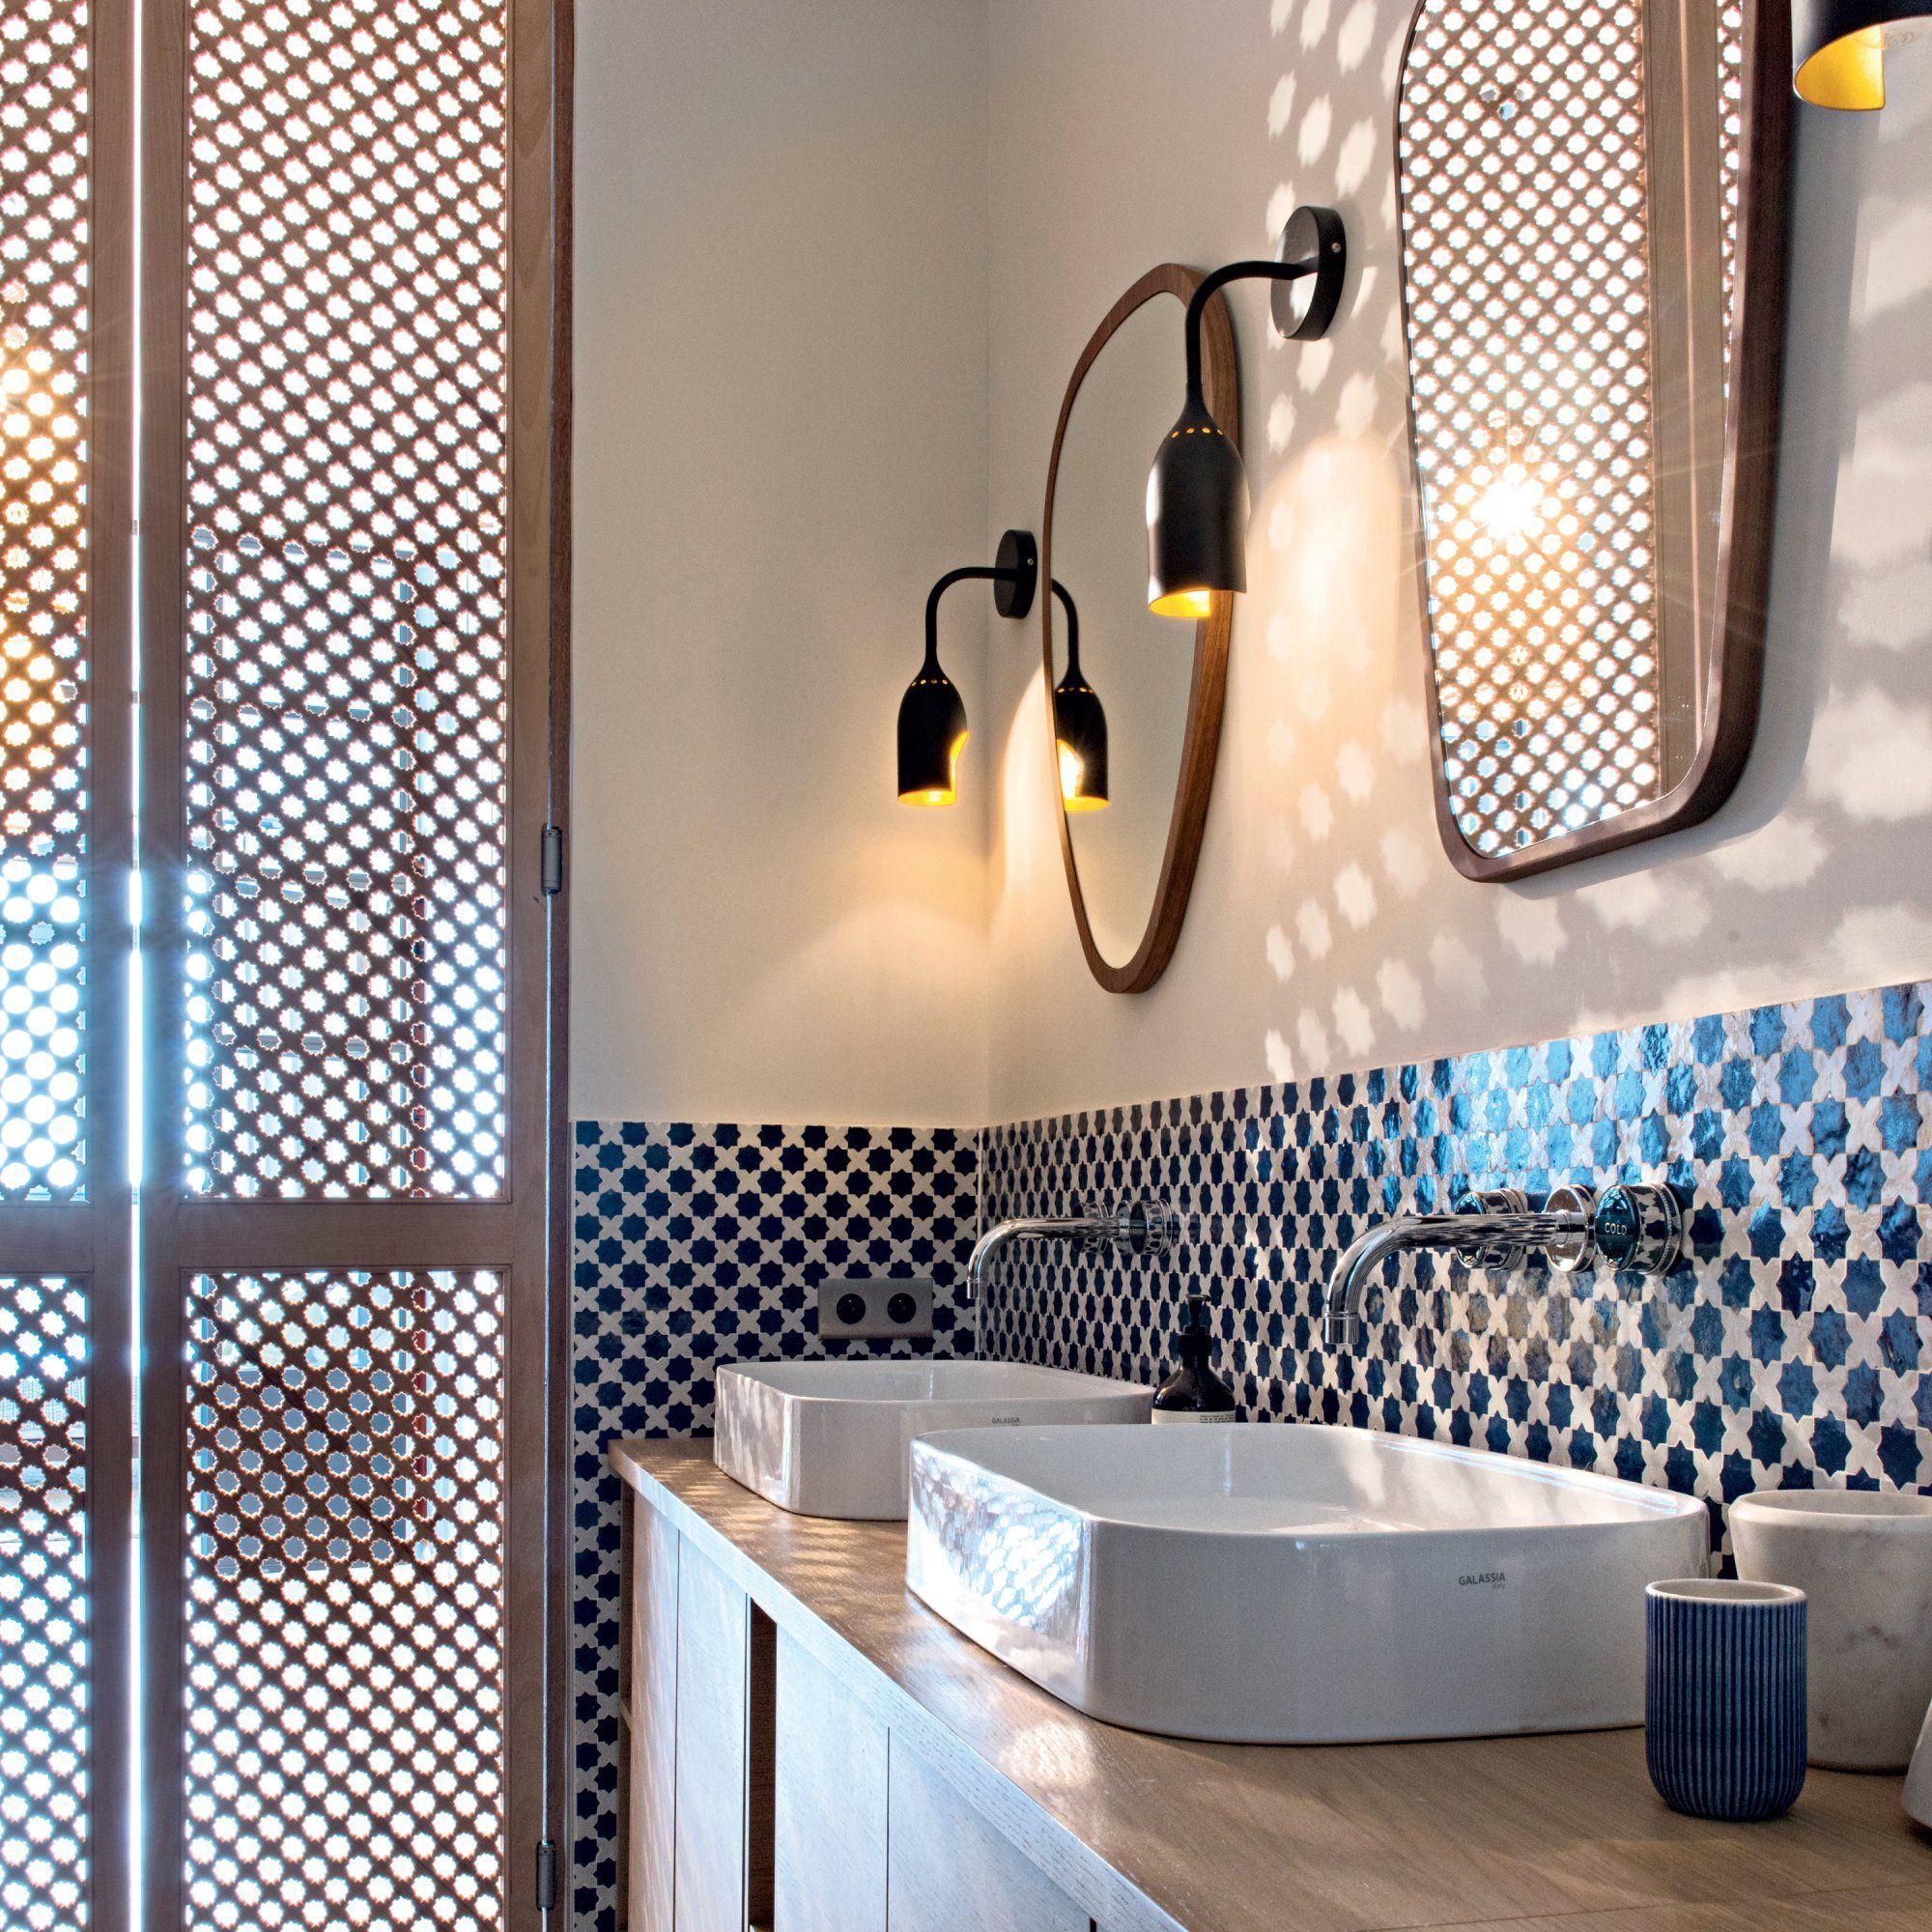 Brilliant Bathroom Lighting Ideas That